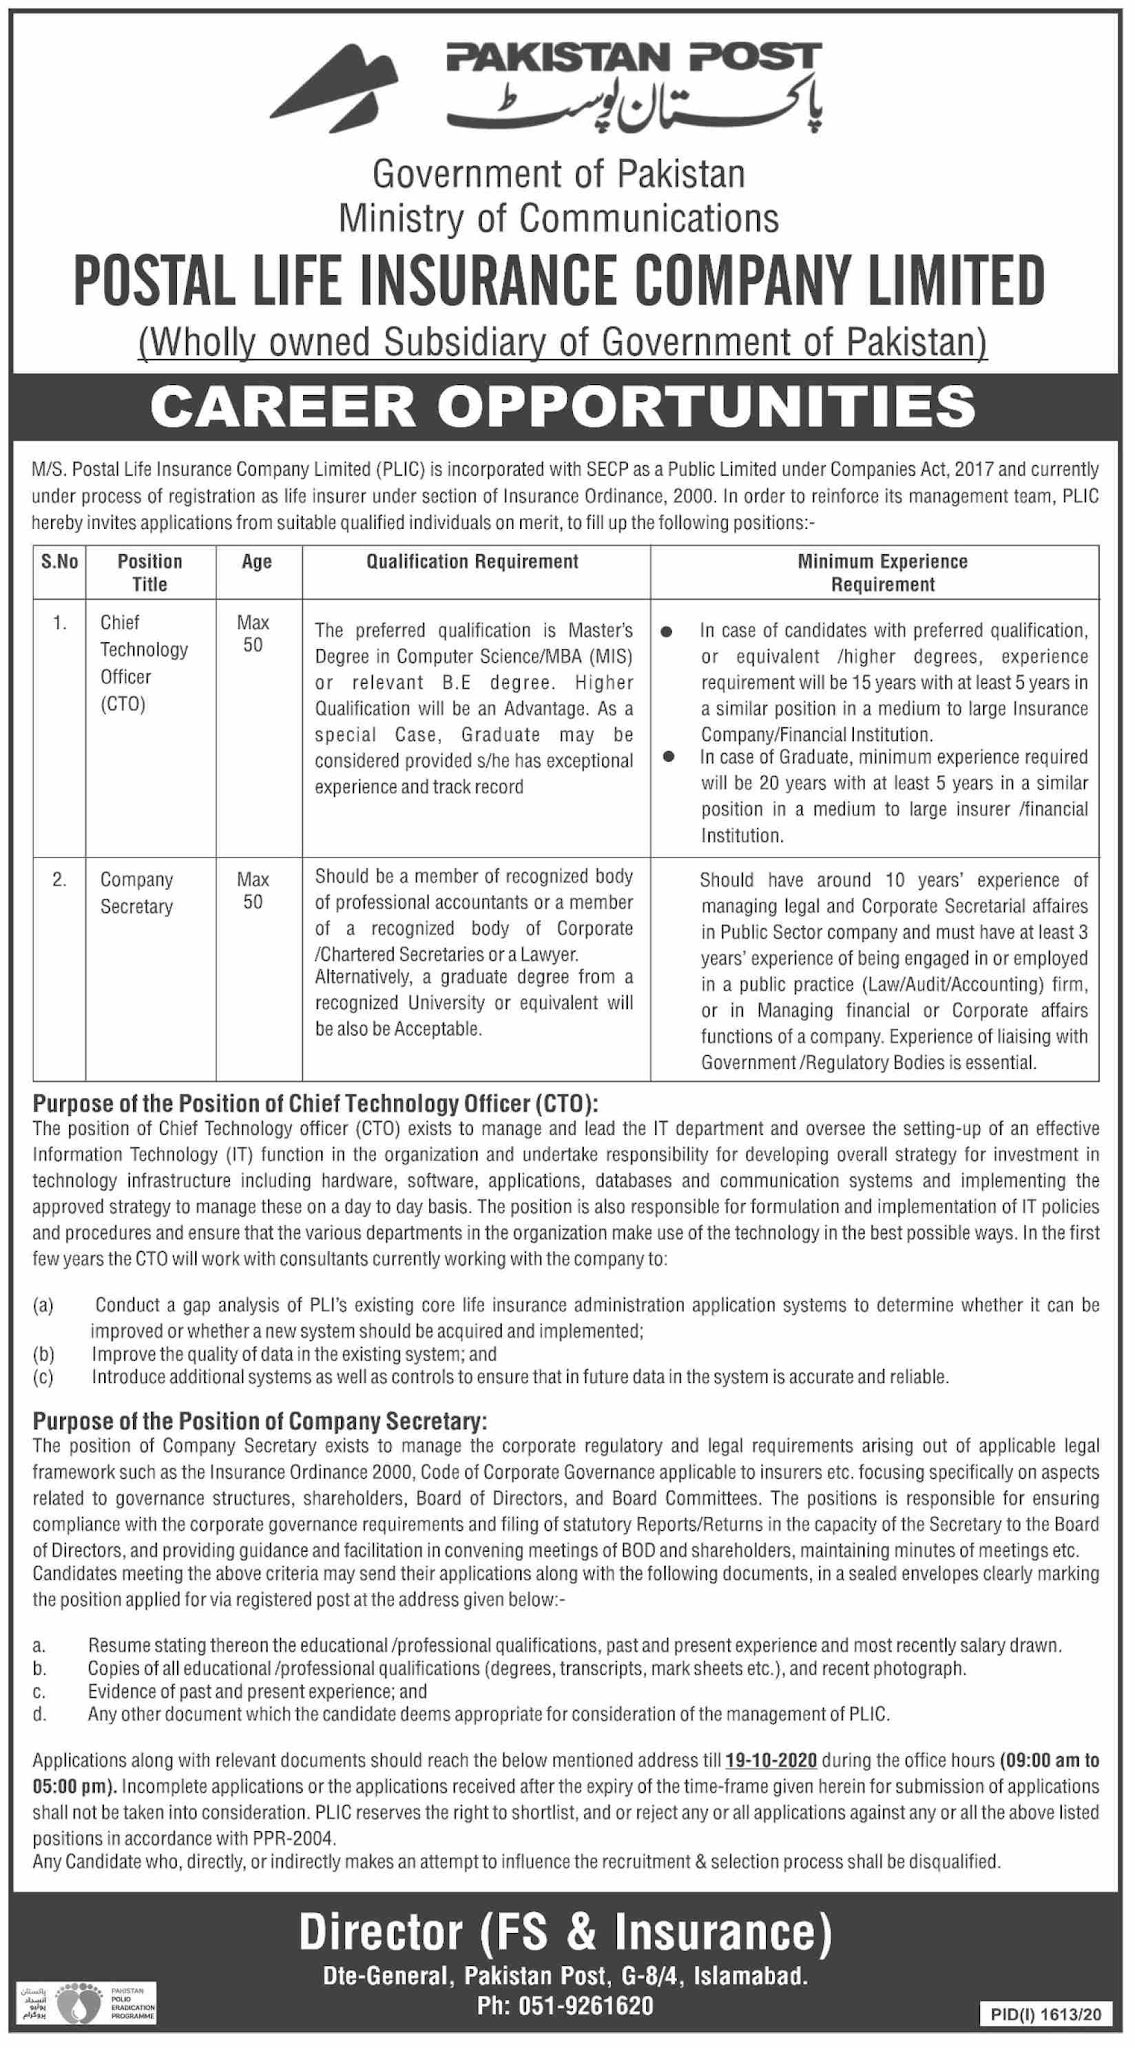 Pakistan Post Postal Life Insurance Company Limited Jobs September 2020